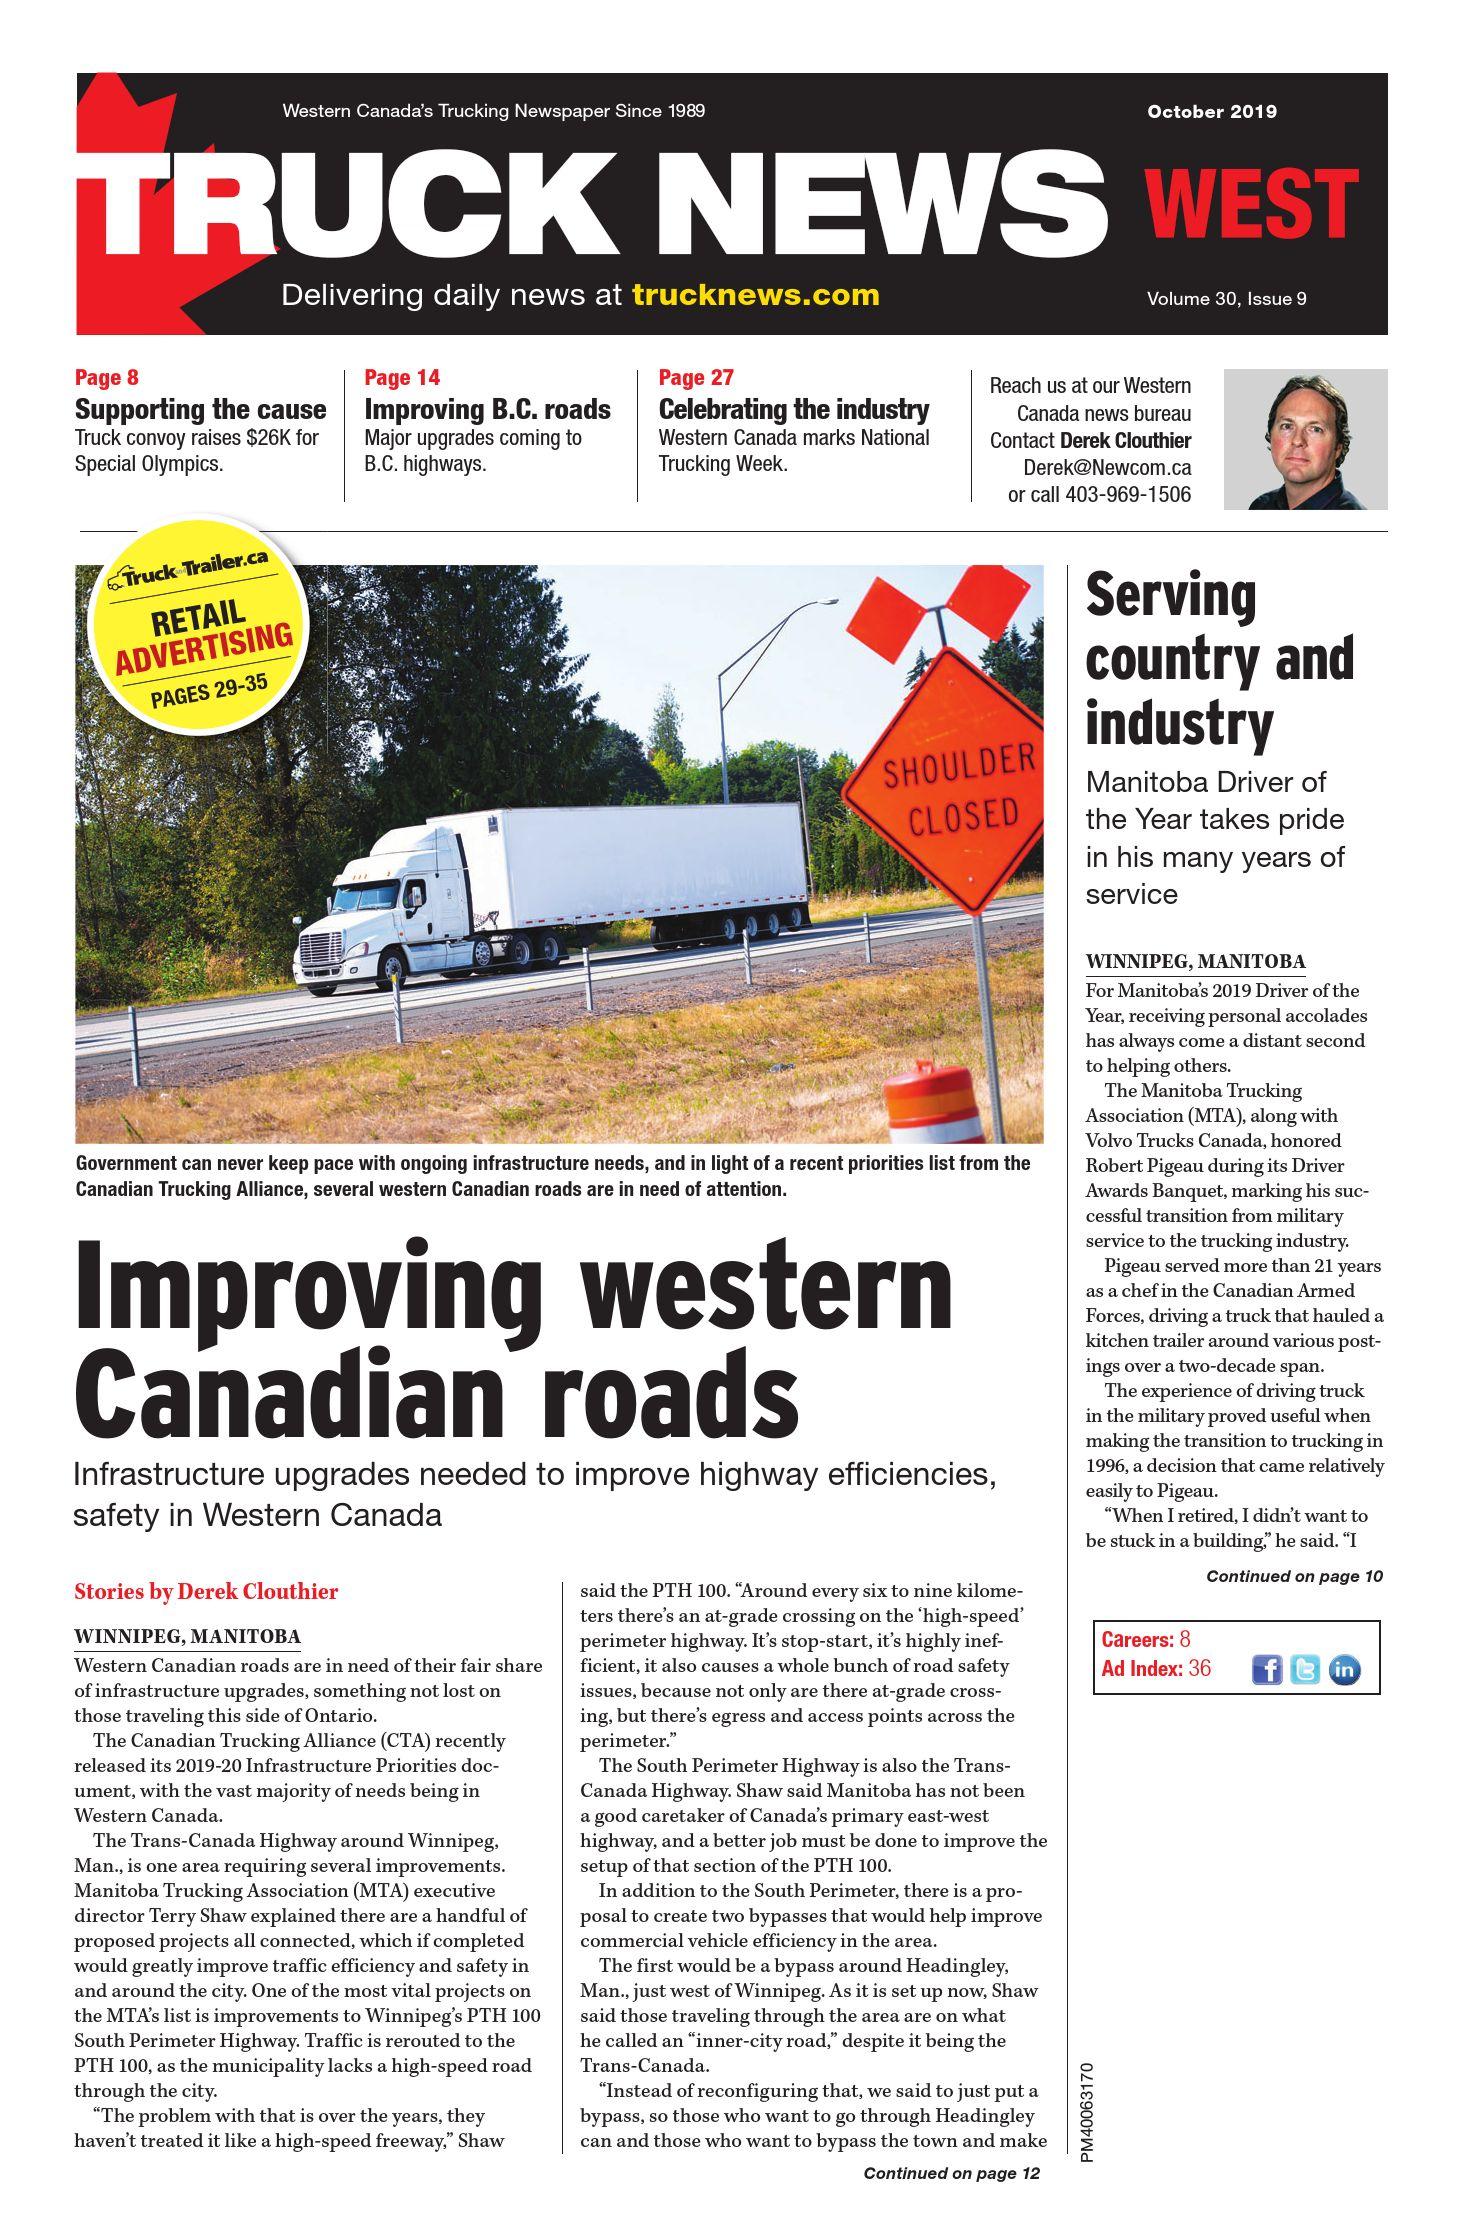 Truck News West – 1 octobre 2019